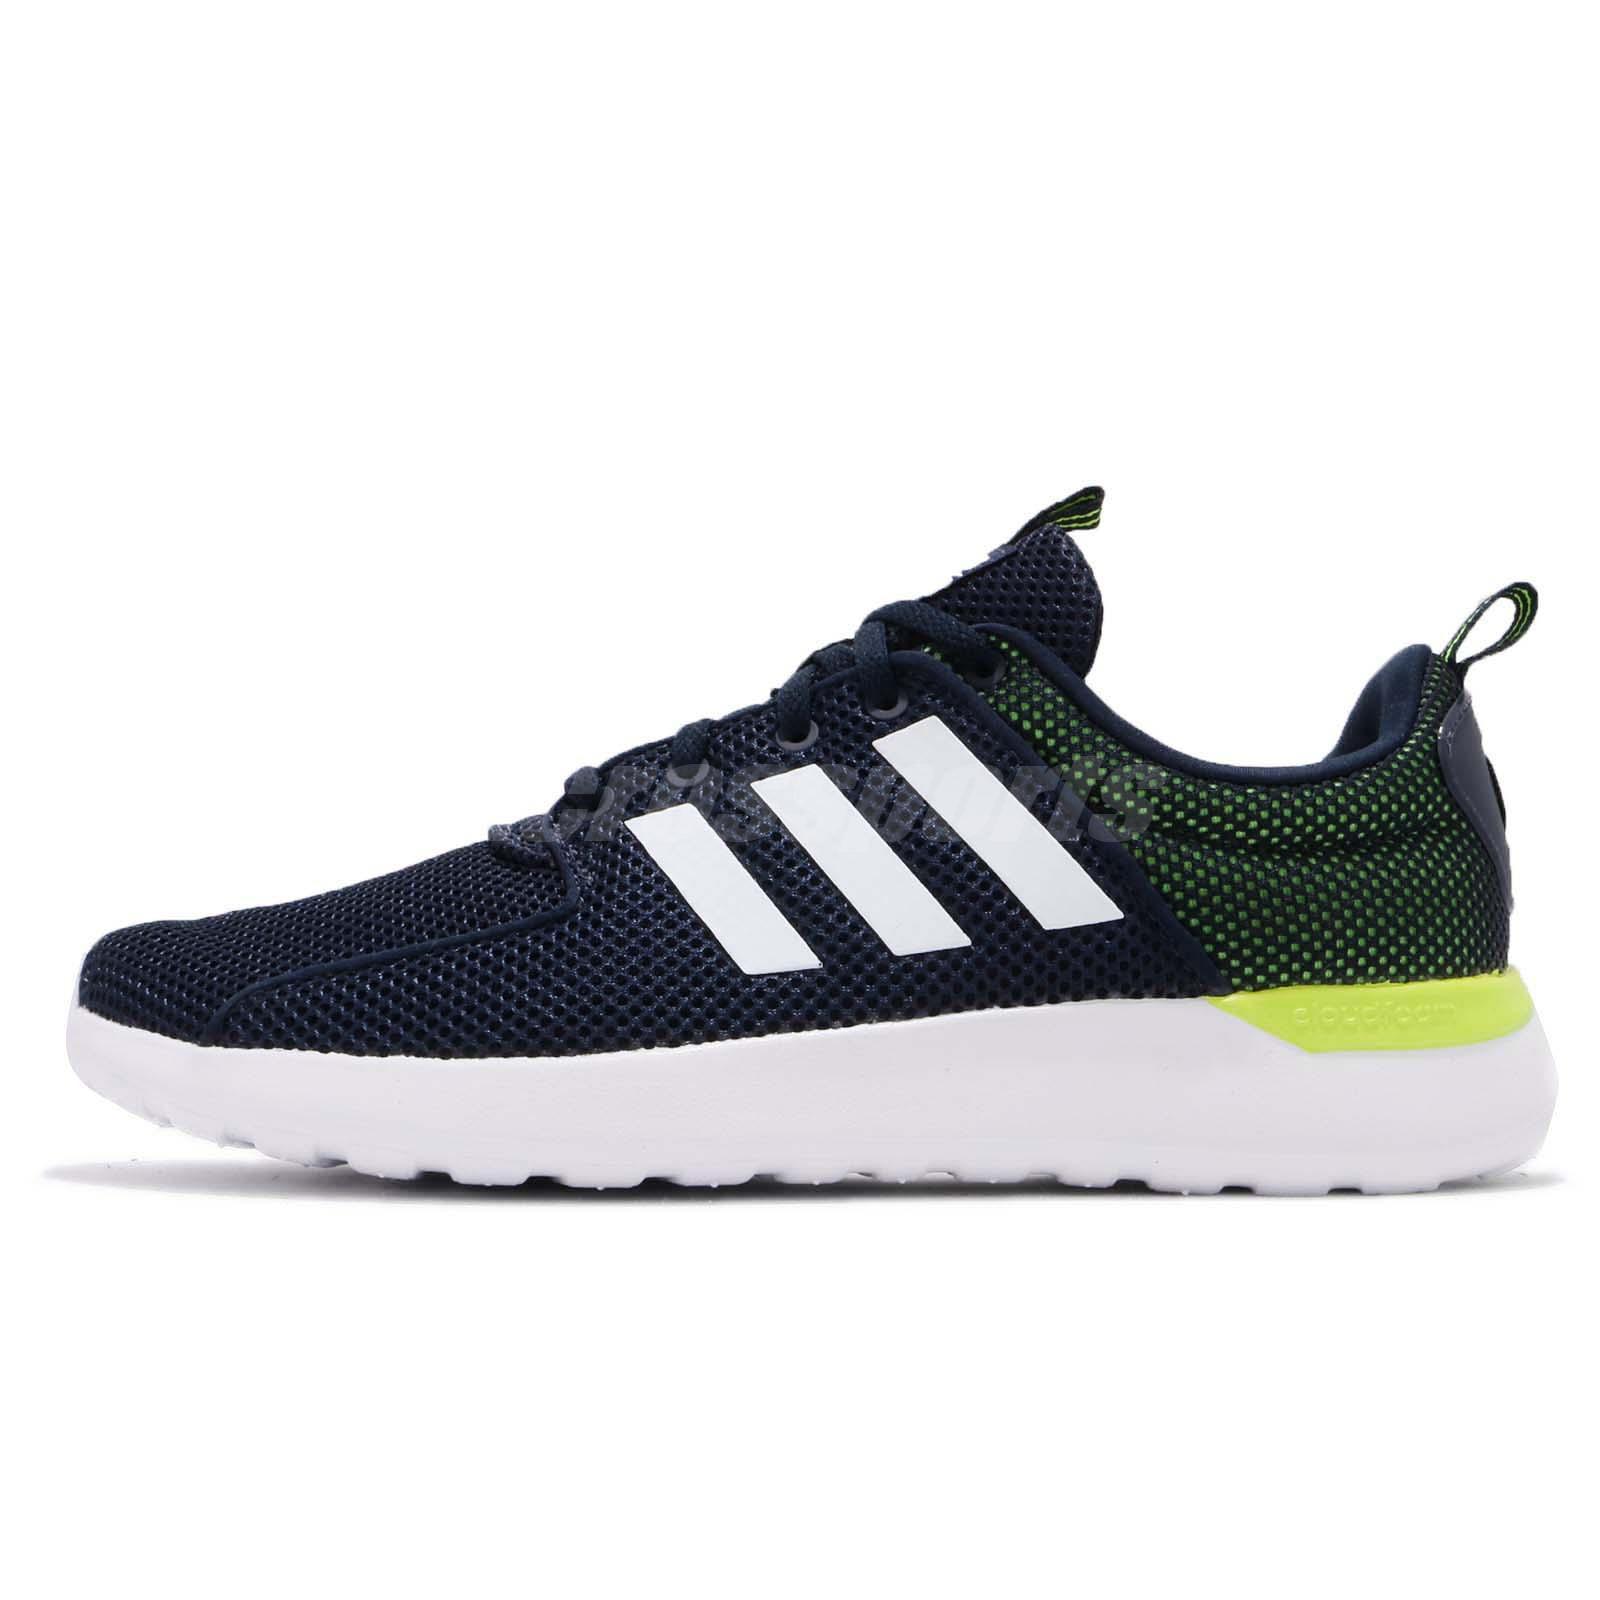 ... ireland adidas neo cf lite racer cloudfoam navy white men running shoes  sneakers db0591 c0cee a3e0f b761d6aaa